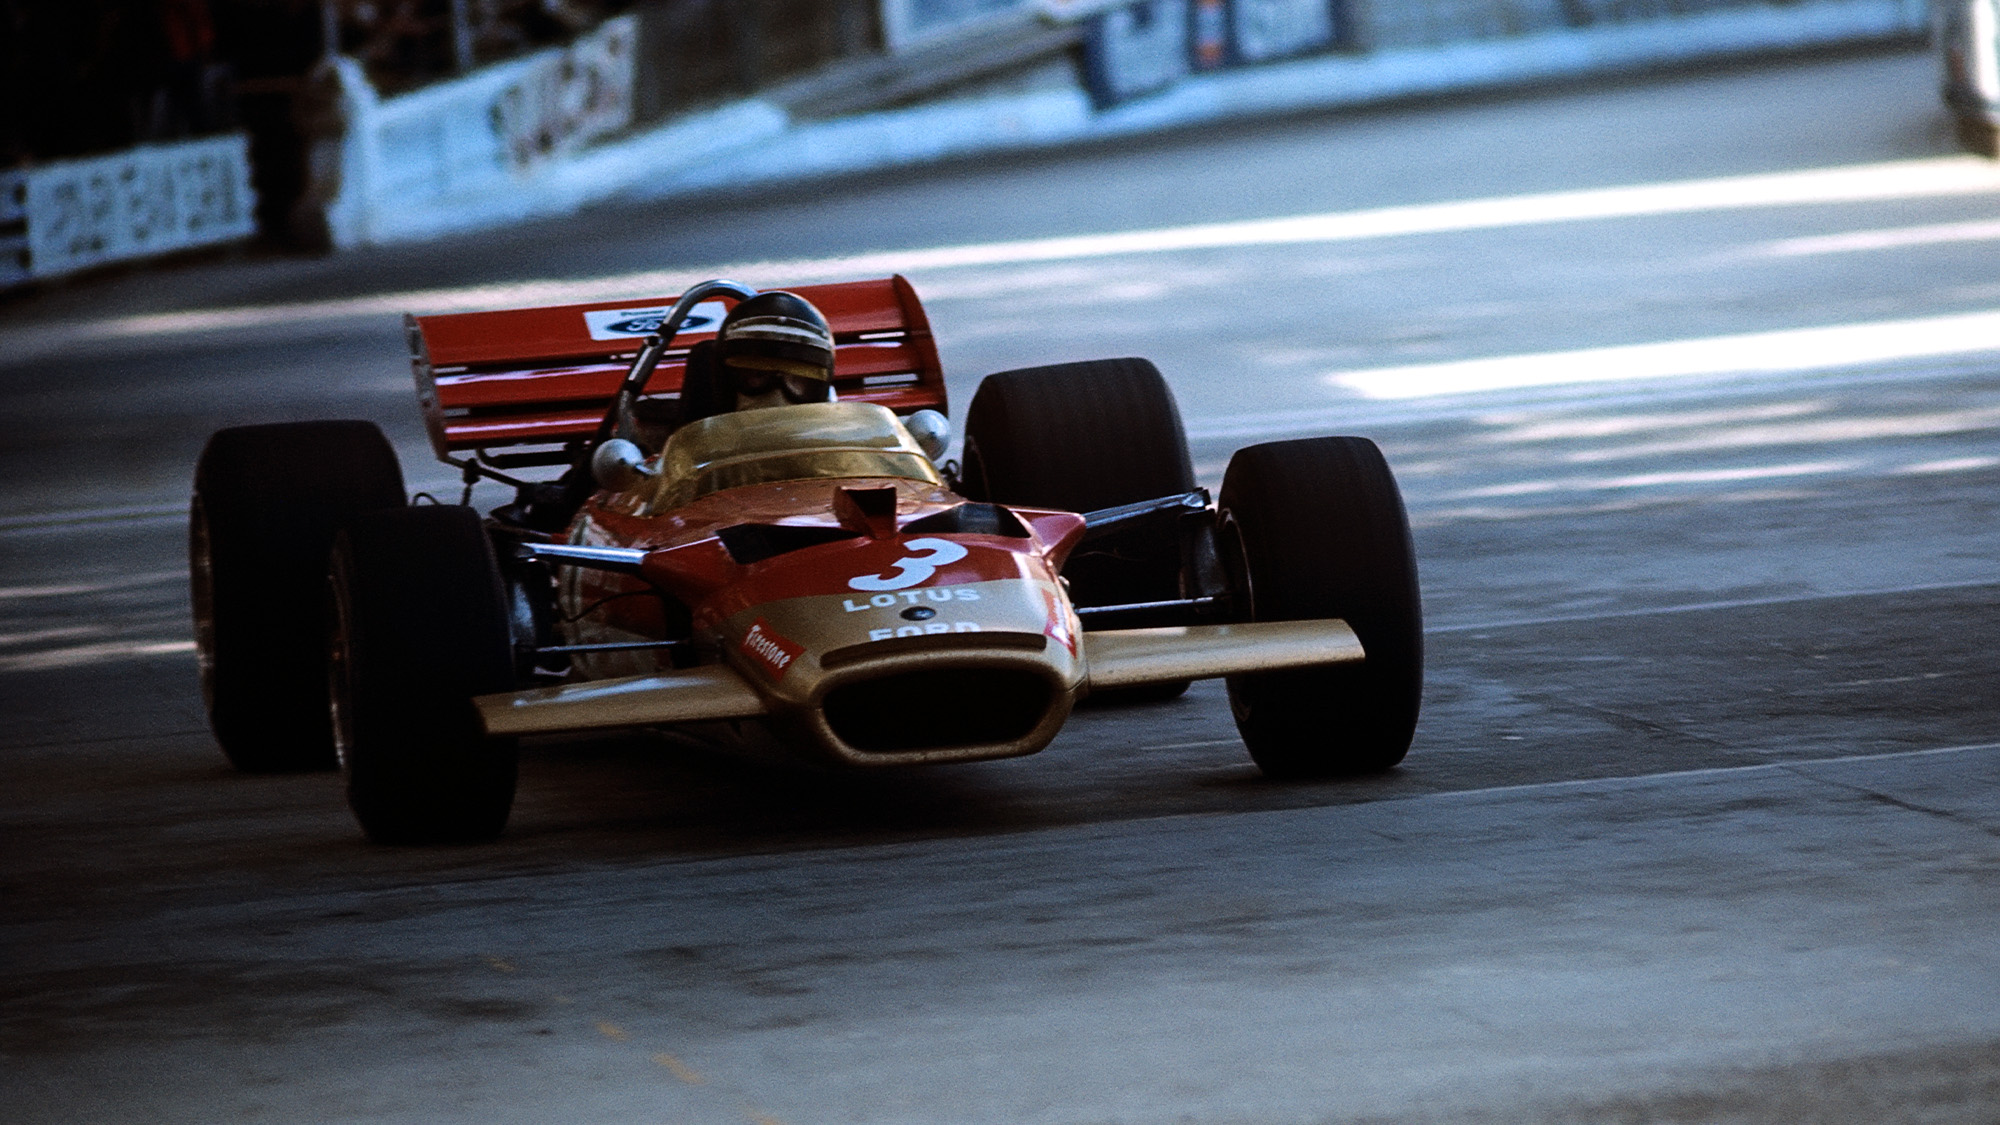 Jochen RIndt at the monaco Grand Prix 1970 in the Lotus 49B